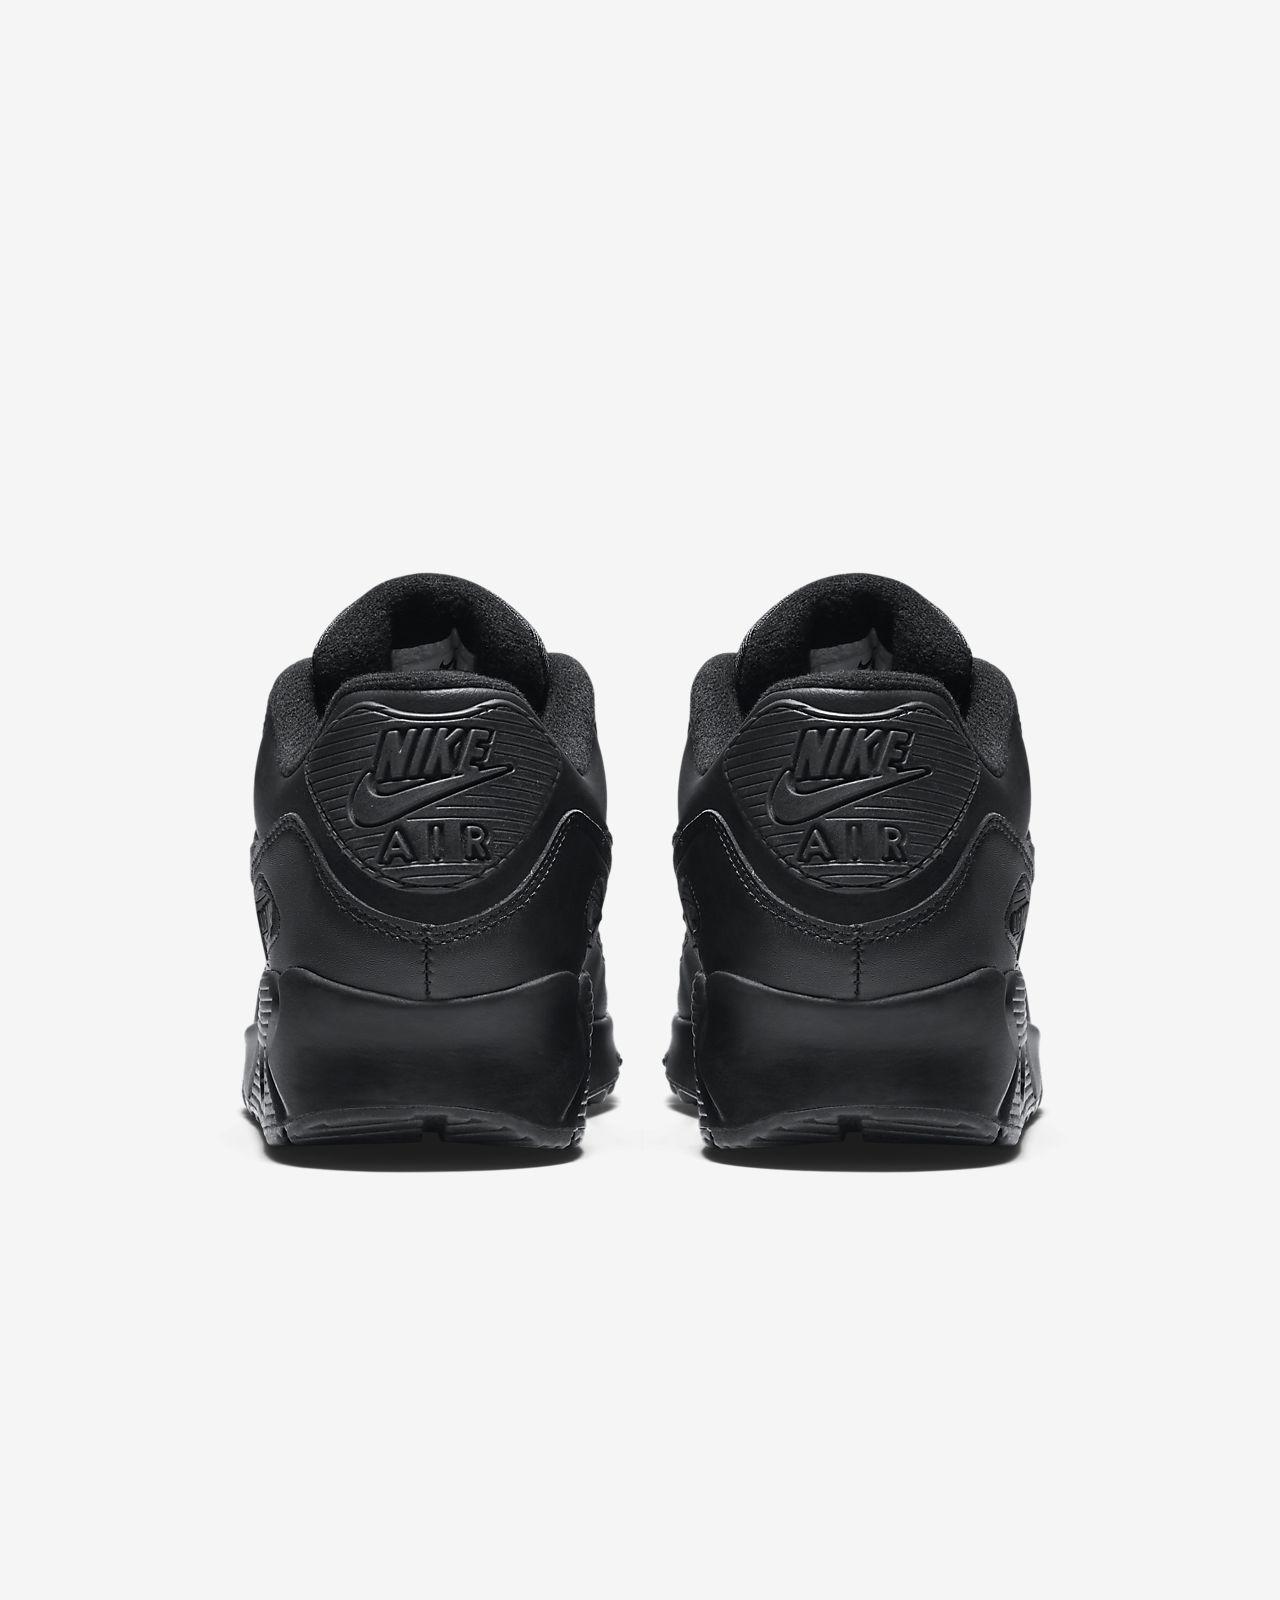 quality design 09596 74362 ... Scarpa Nike Air Max 90 Leather - Uomo